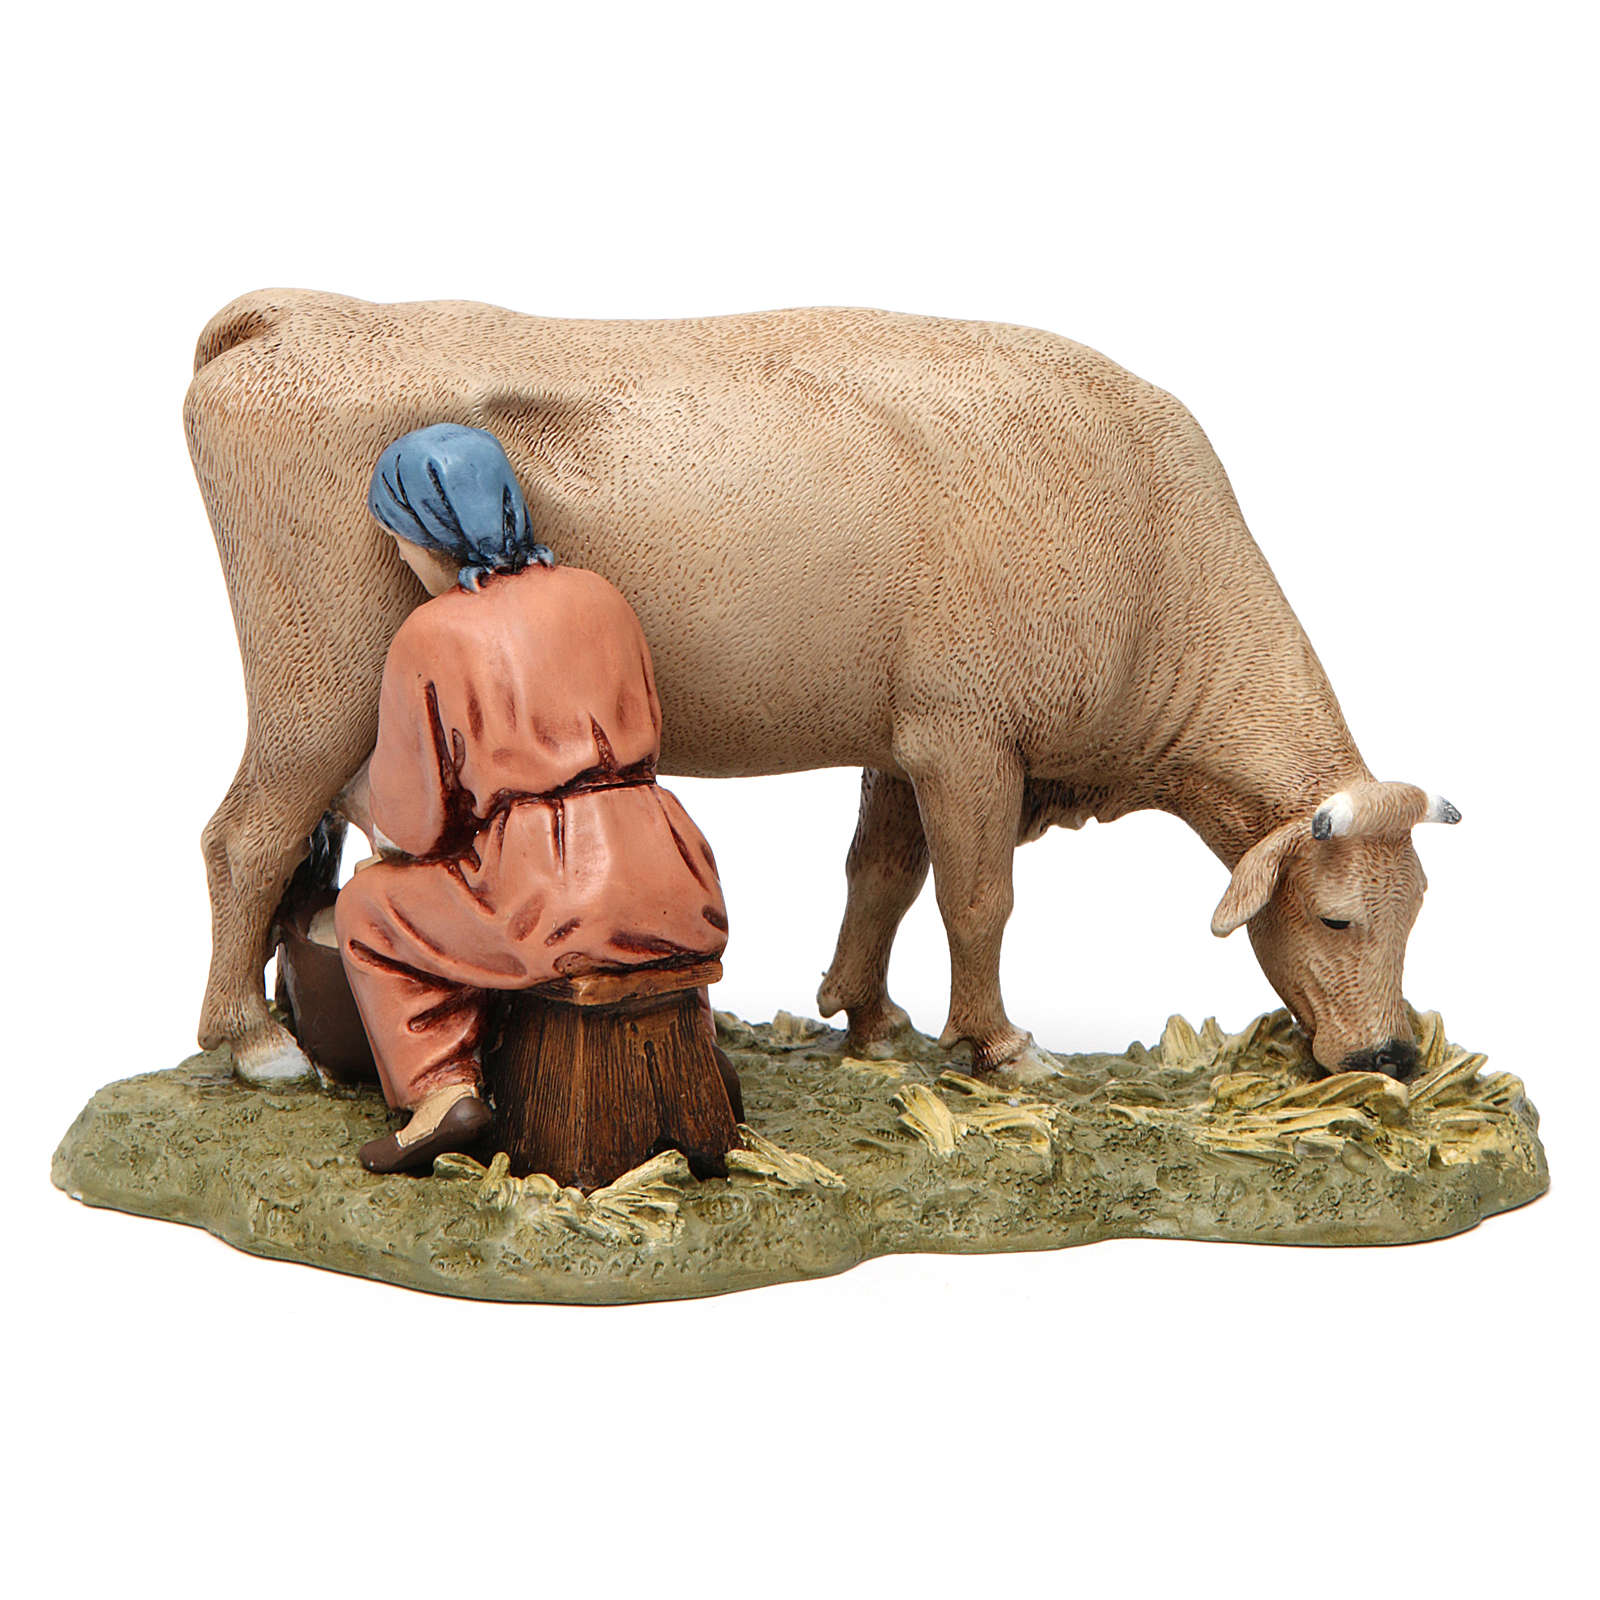 Milkmaid with cow in resin Moranduzzo Nativity Scene 13 cm 4